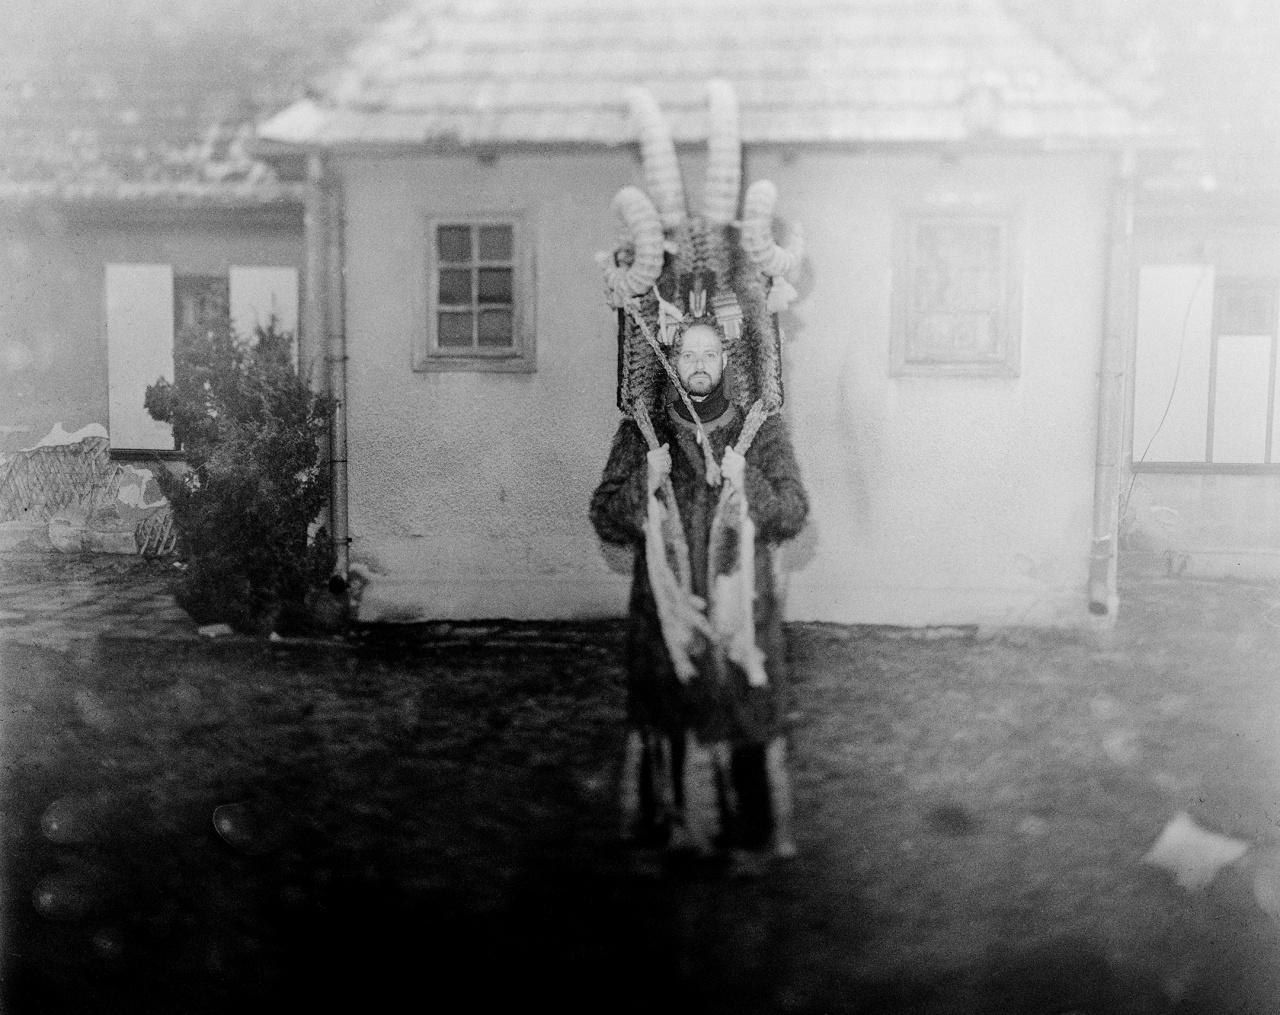 szynski-Jew, Death and a Goat-c41-submission-5.jpg